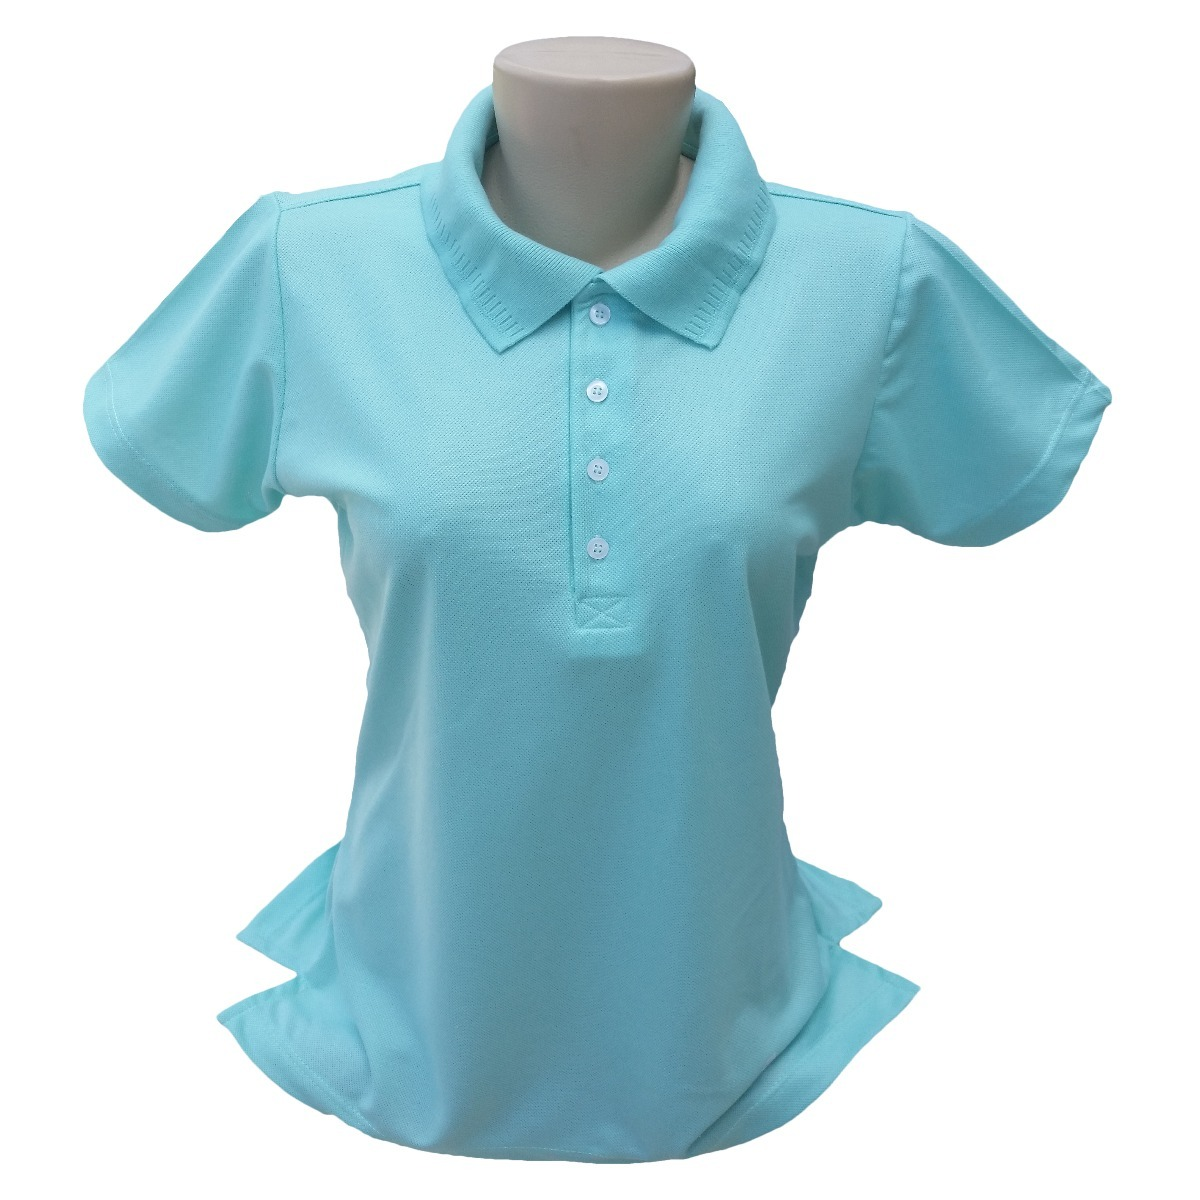 50ad1fdf4f 50 camisas polo feminina piquet 100% poliéster para estampar. Carregando  zoom.